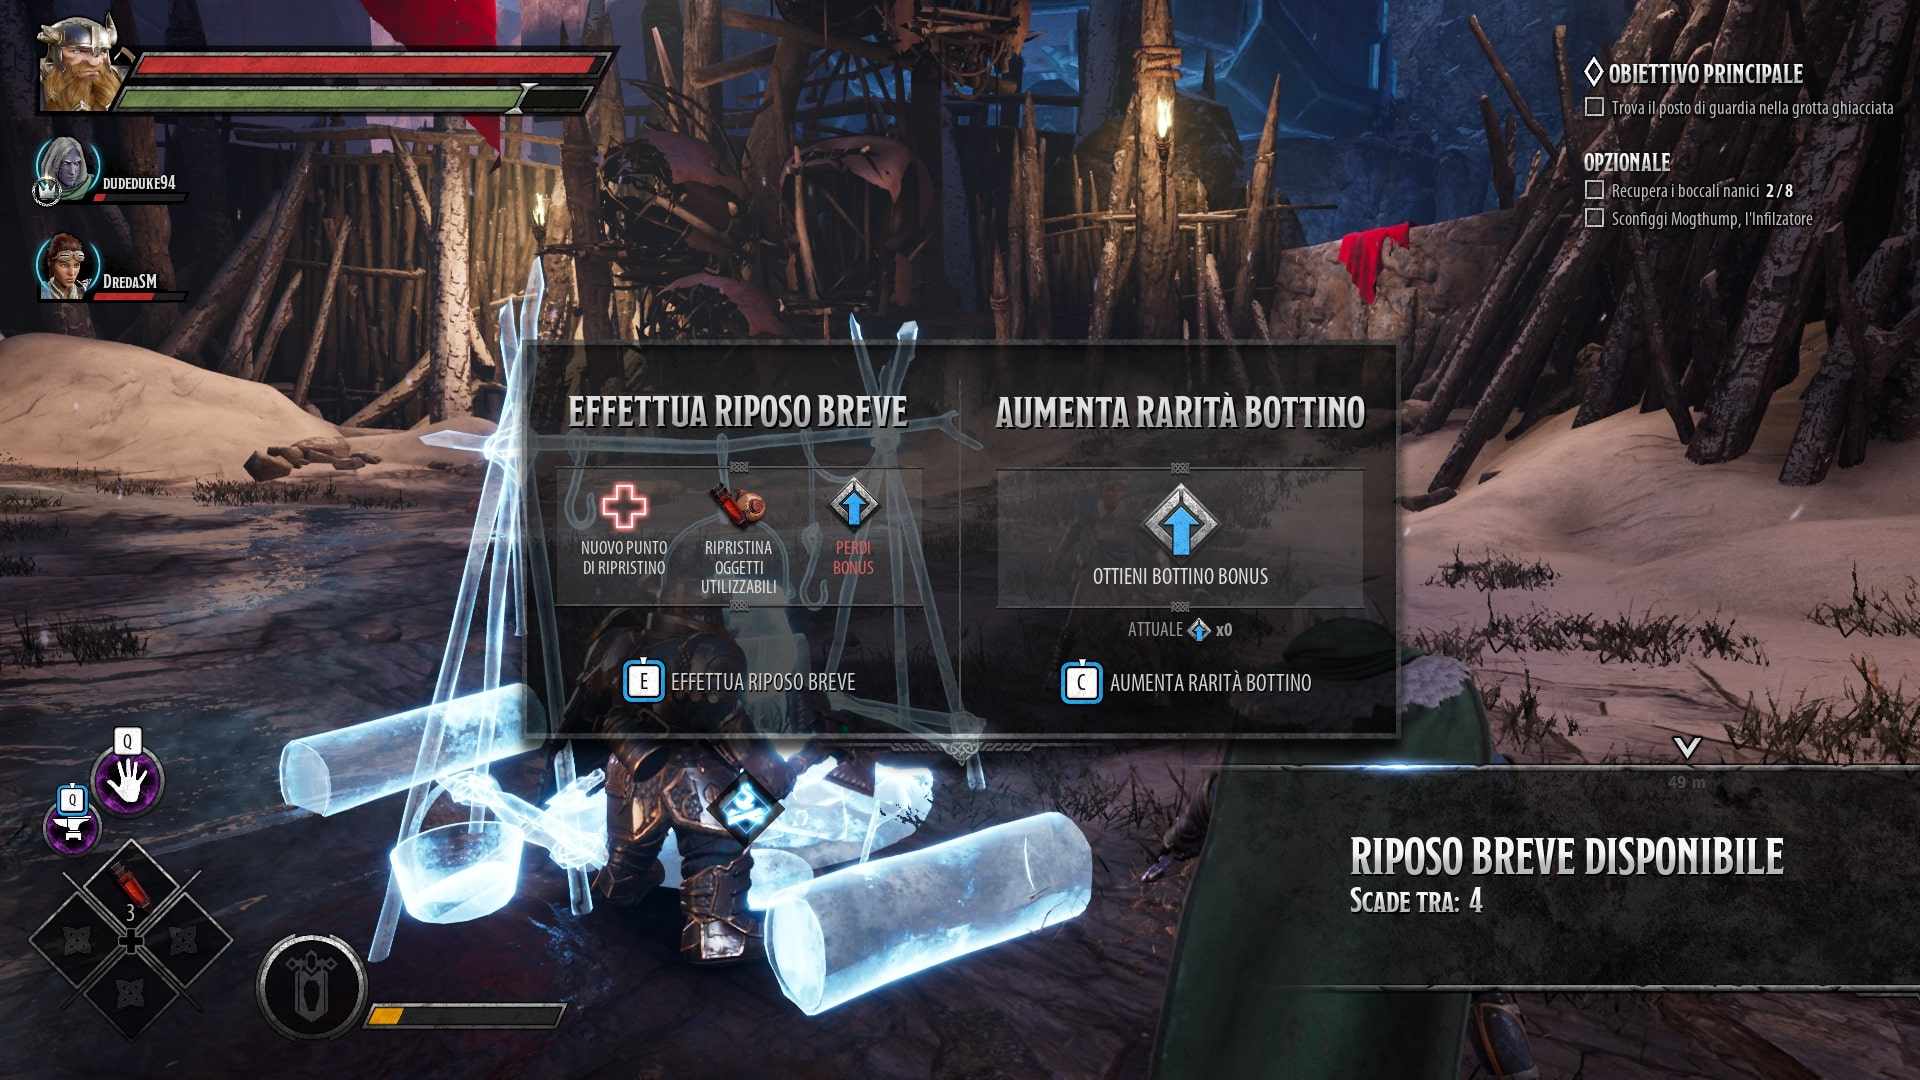 Dungeons & Dragons Dark Alliance xbox game pass Dungeons & Dragons Dark Alliance steam